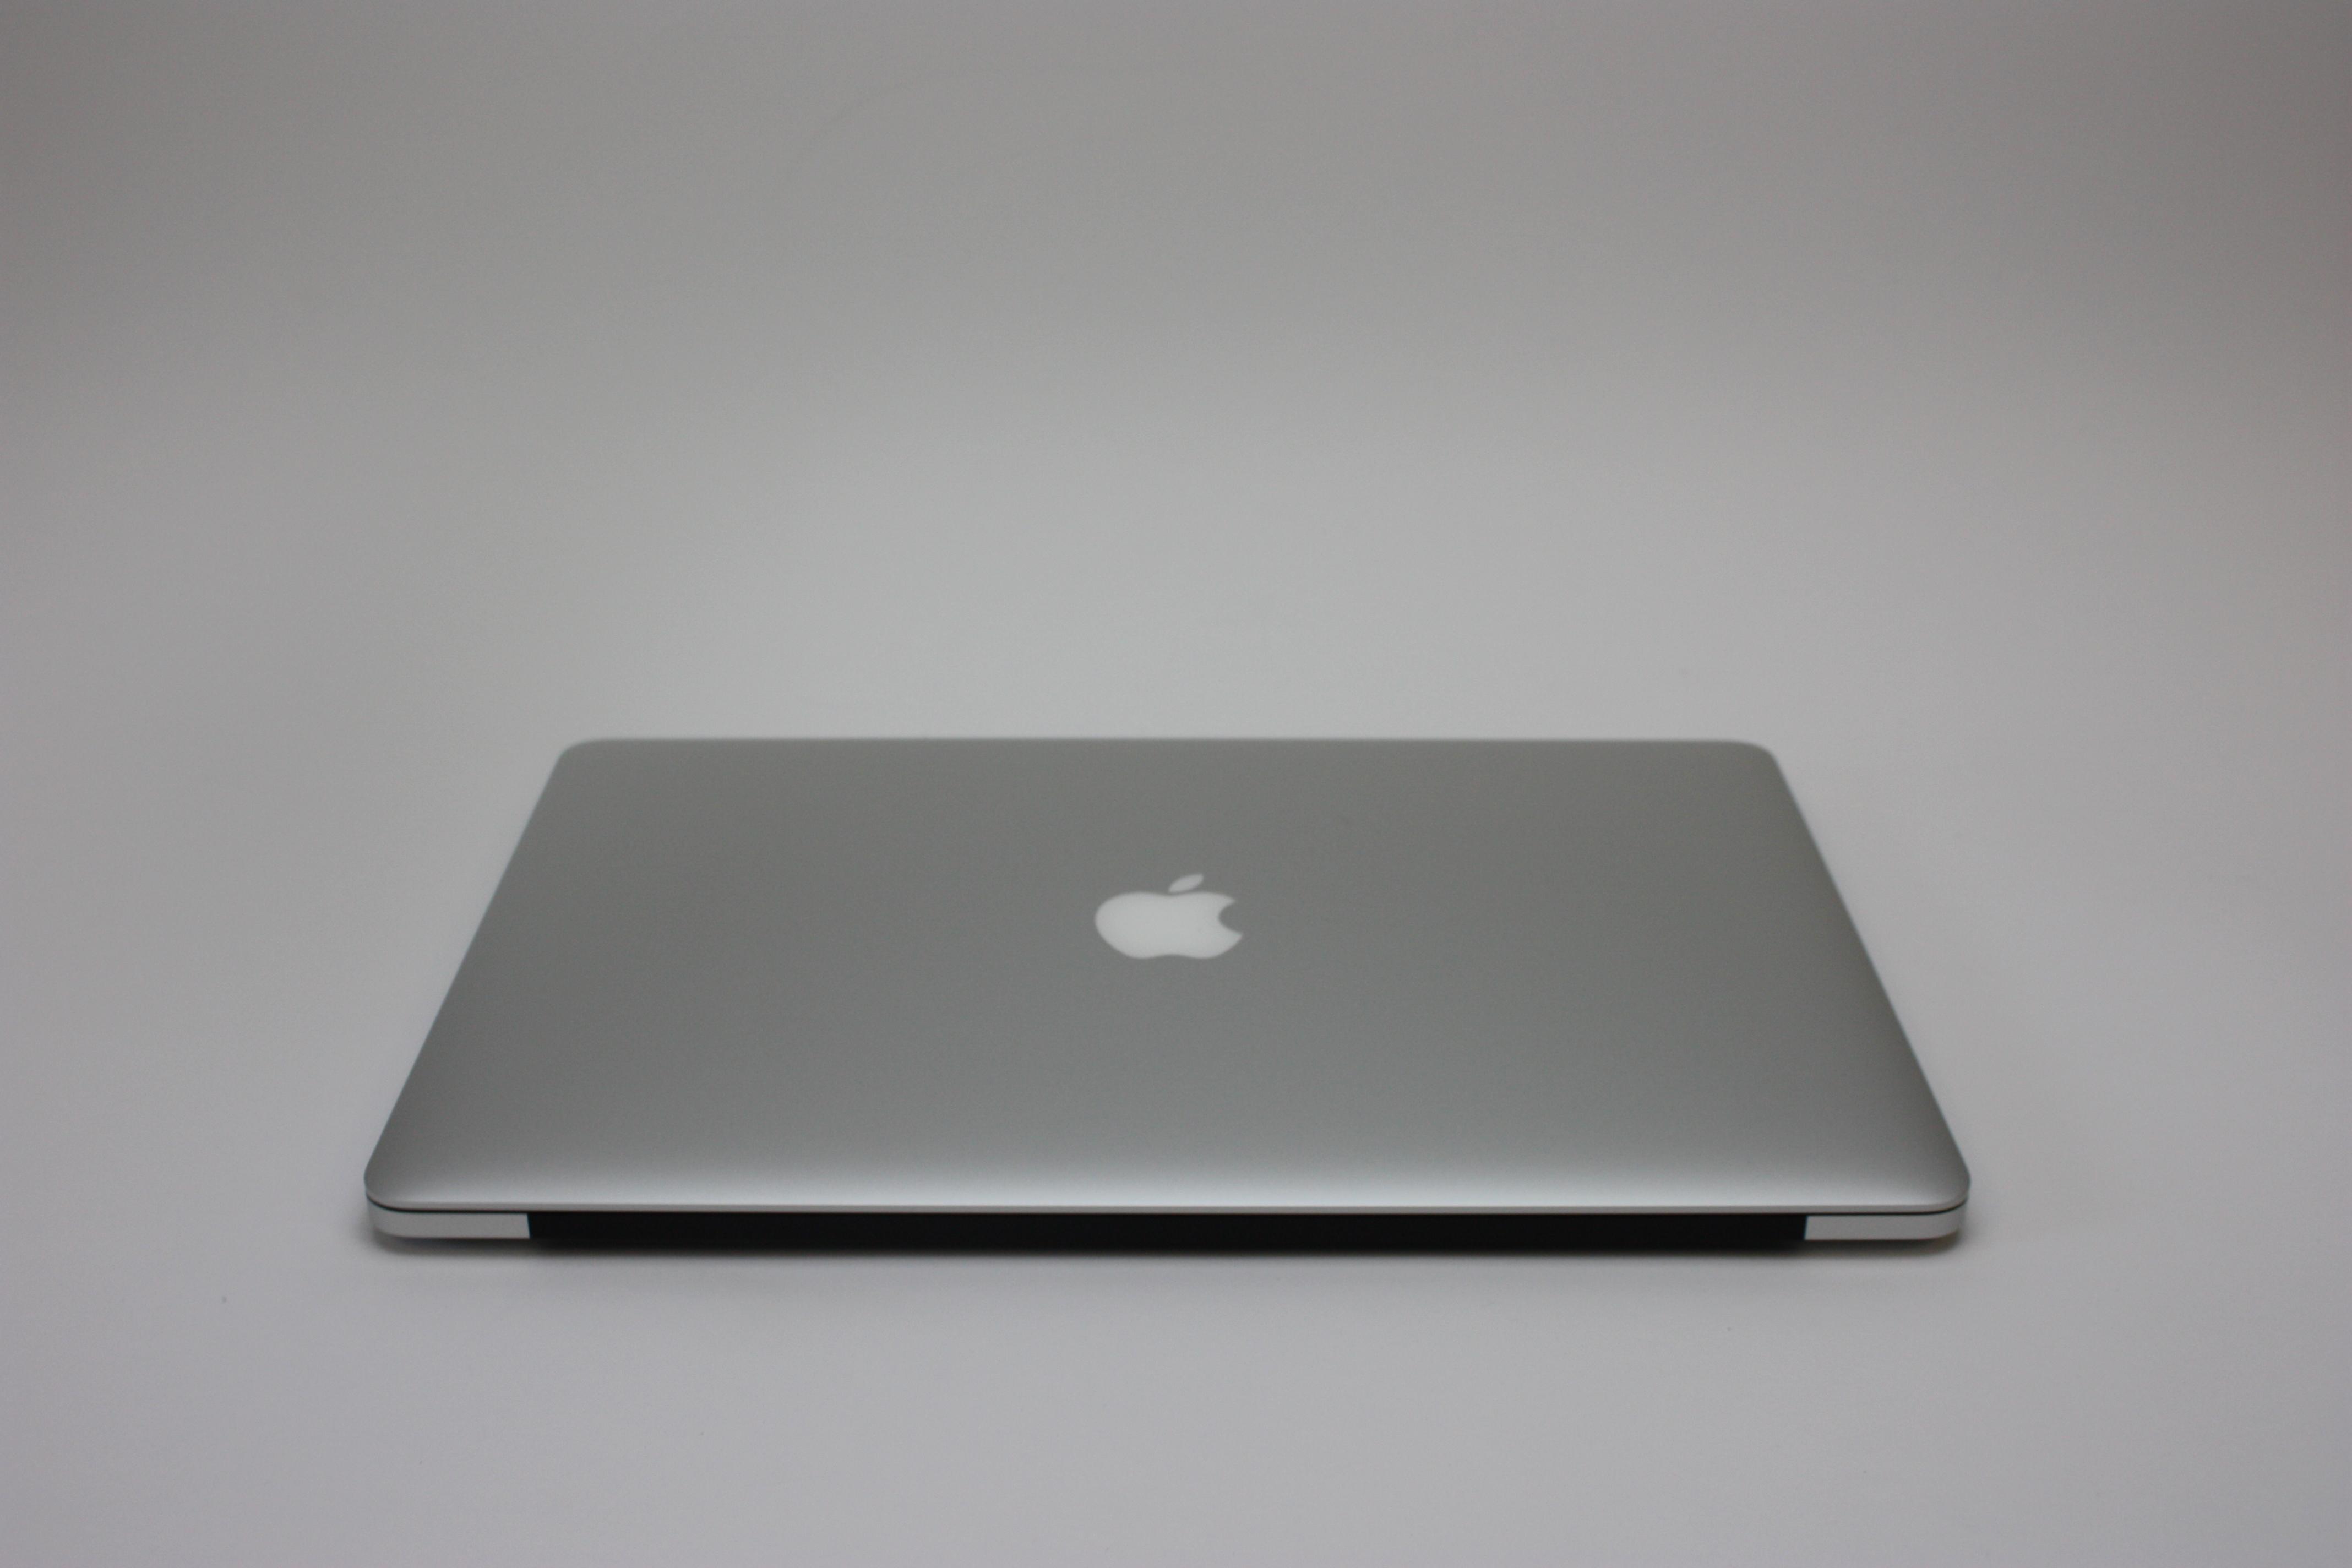 MacBook Pro 15-inch Retina, 2.2 GHz Intel Core i7, 16 GB 1600 MHz DDR3, 256 GB Flash Storage, image 6